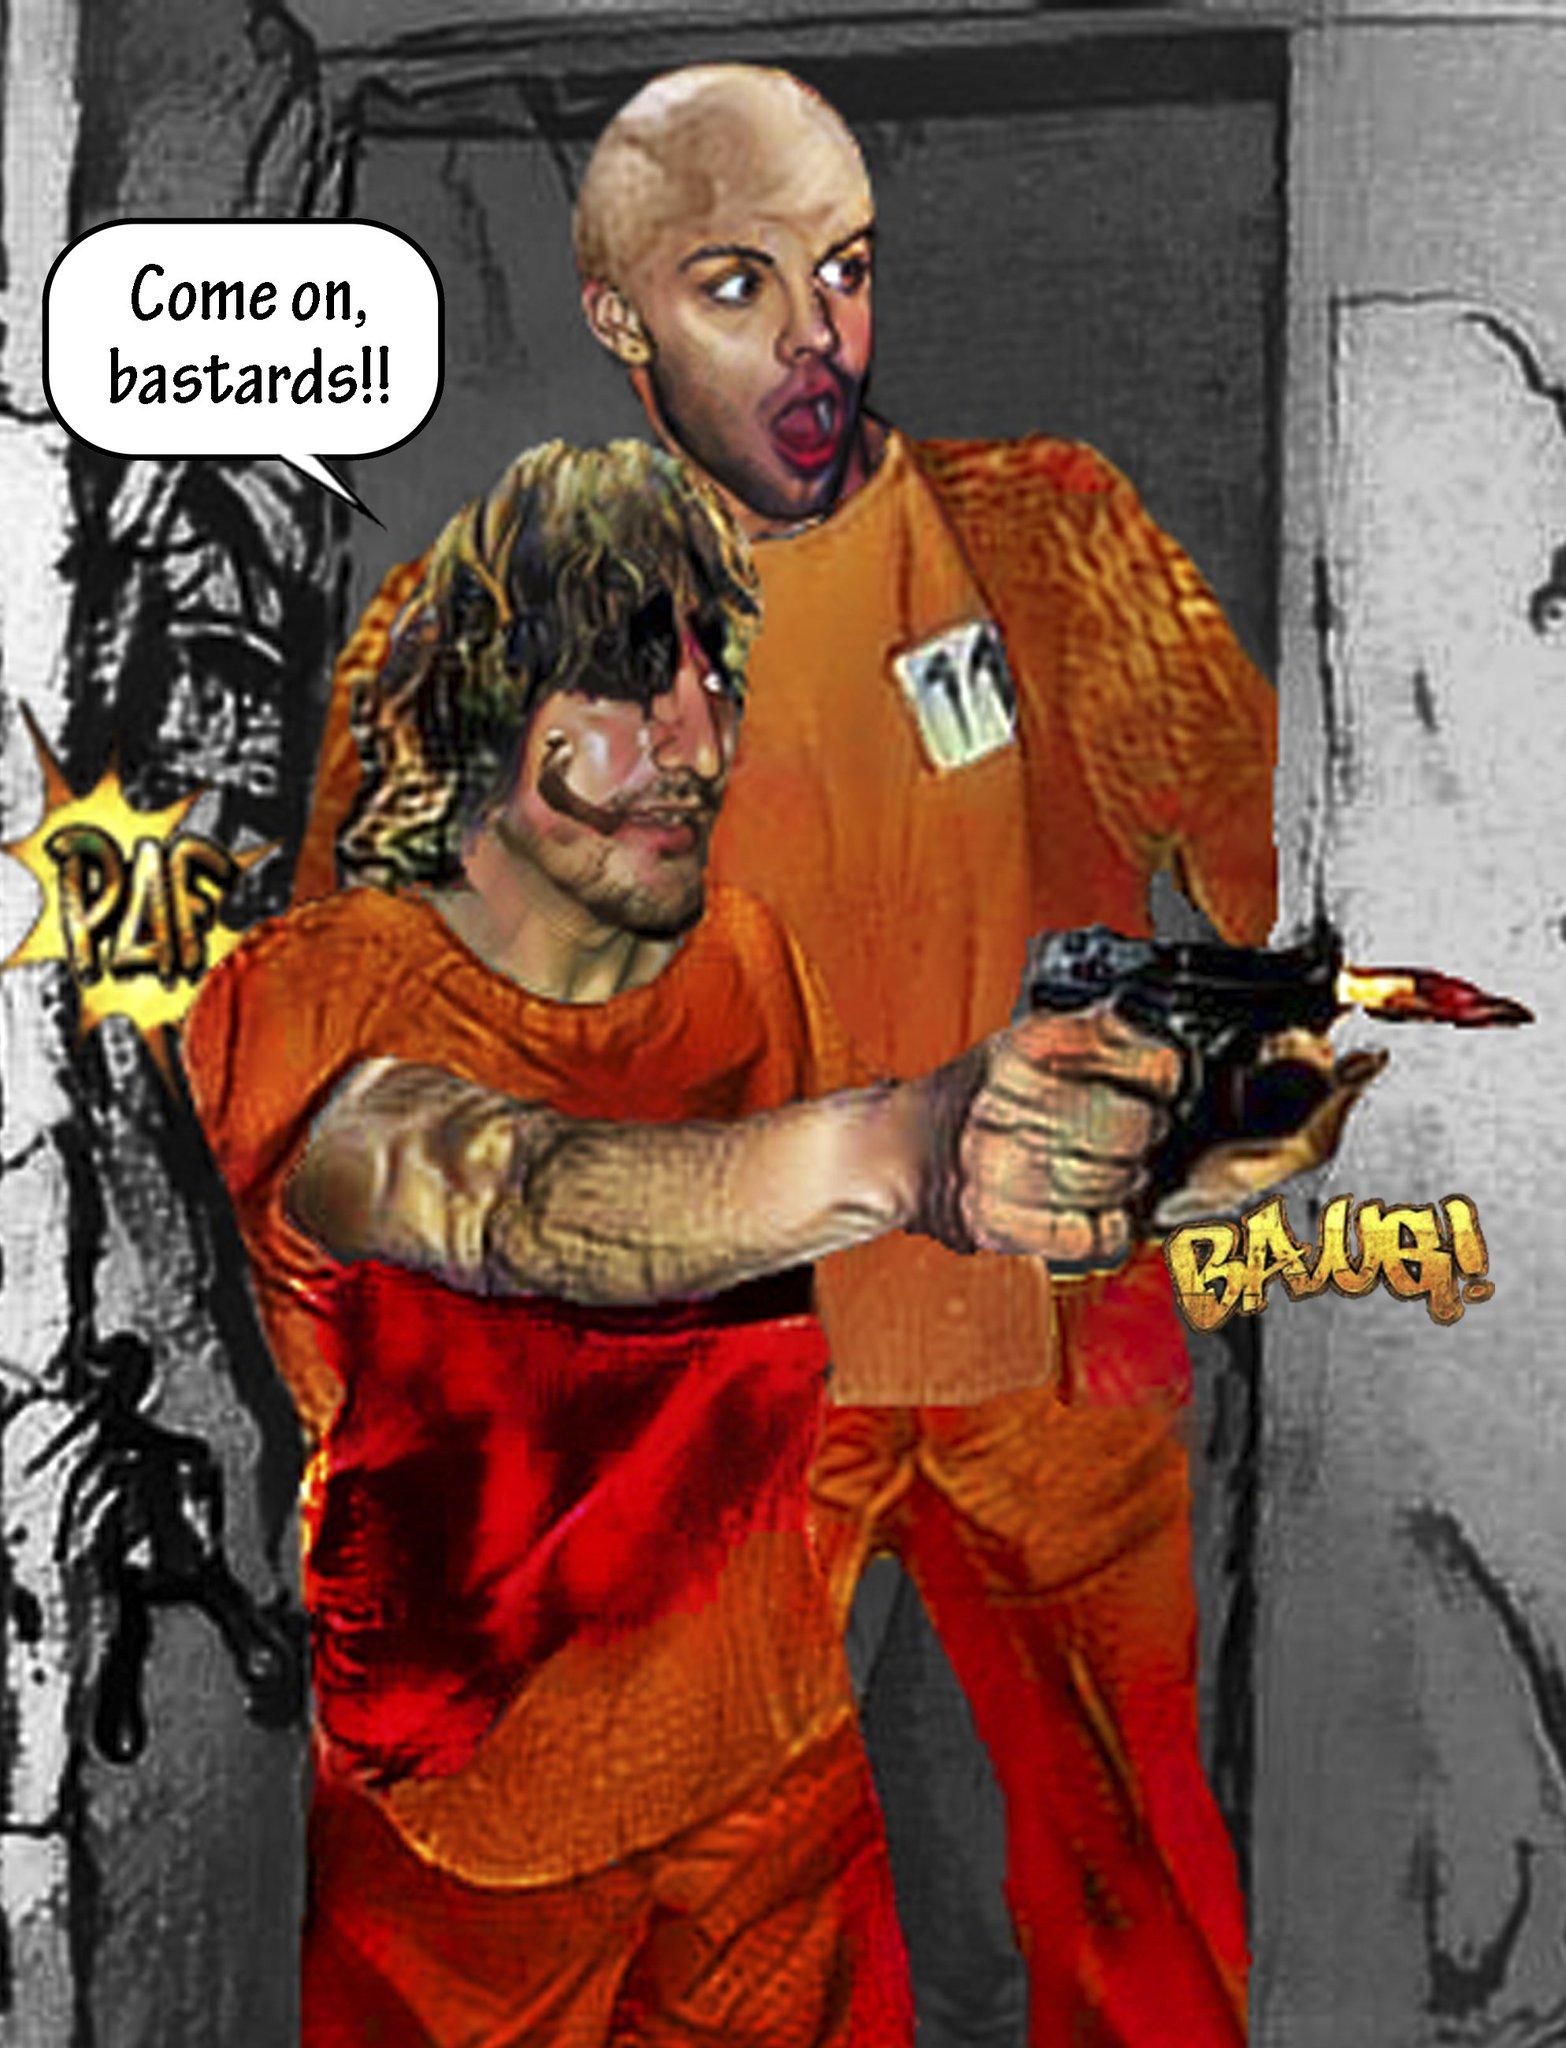 Agents Of Chaos On Twitter The Joker With Aaron Helzinger Aka